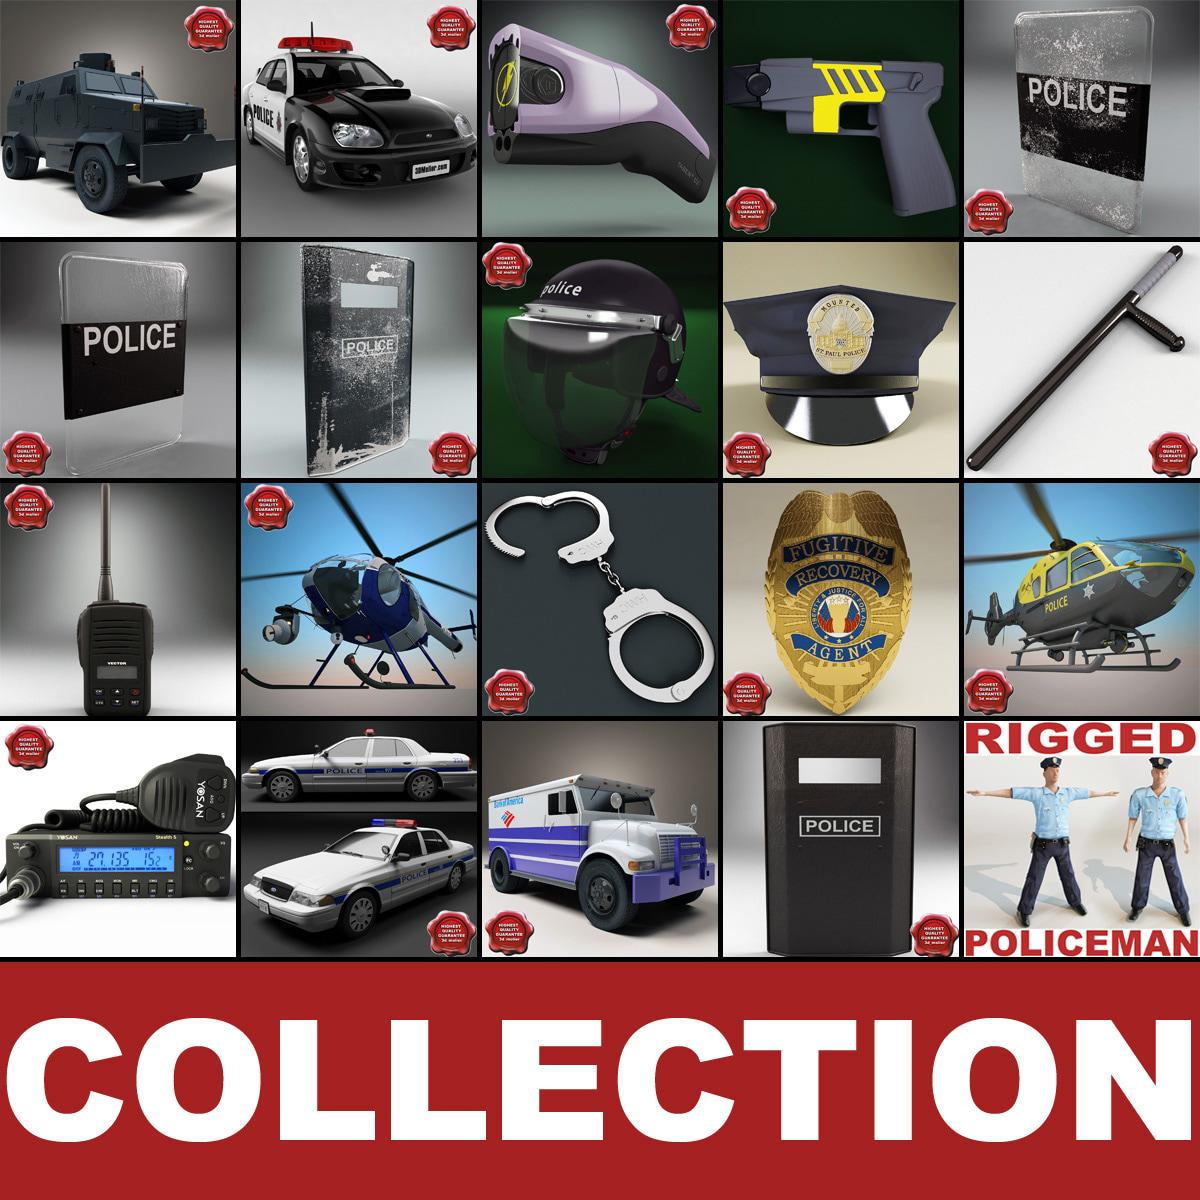 Police_Big_Collection_000.jpg